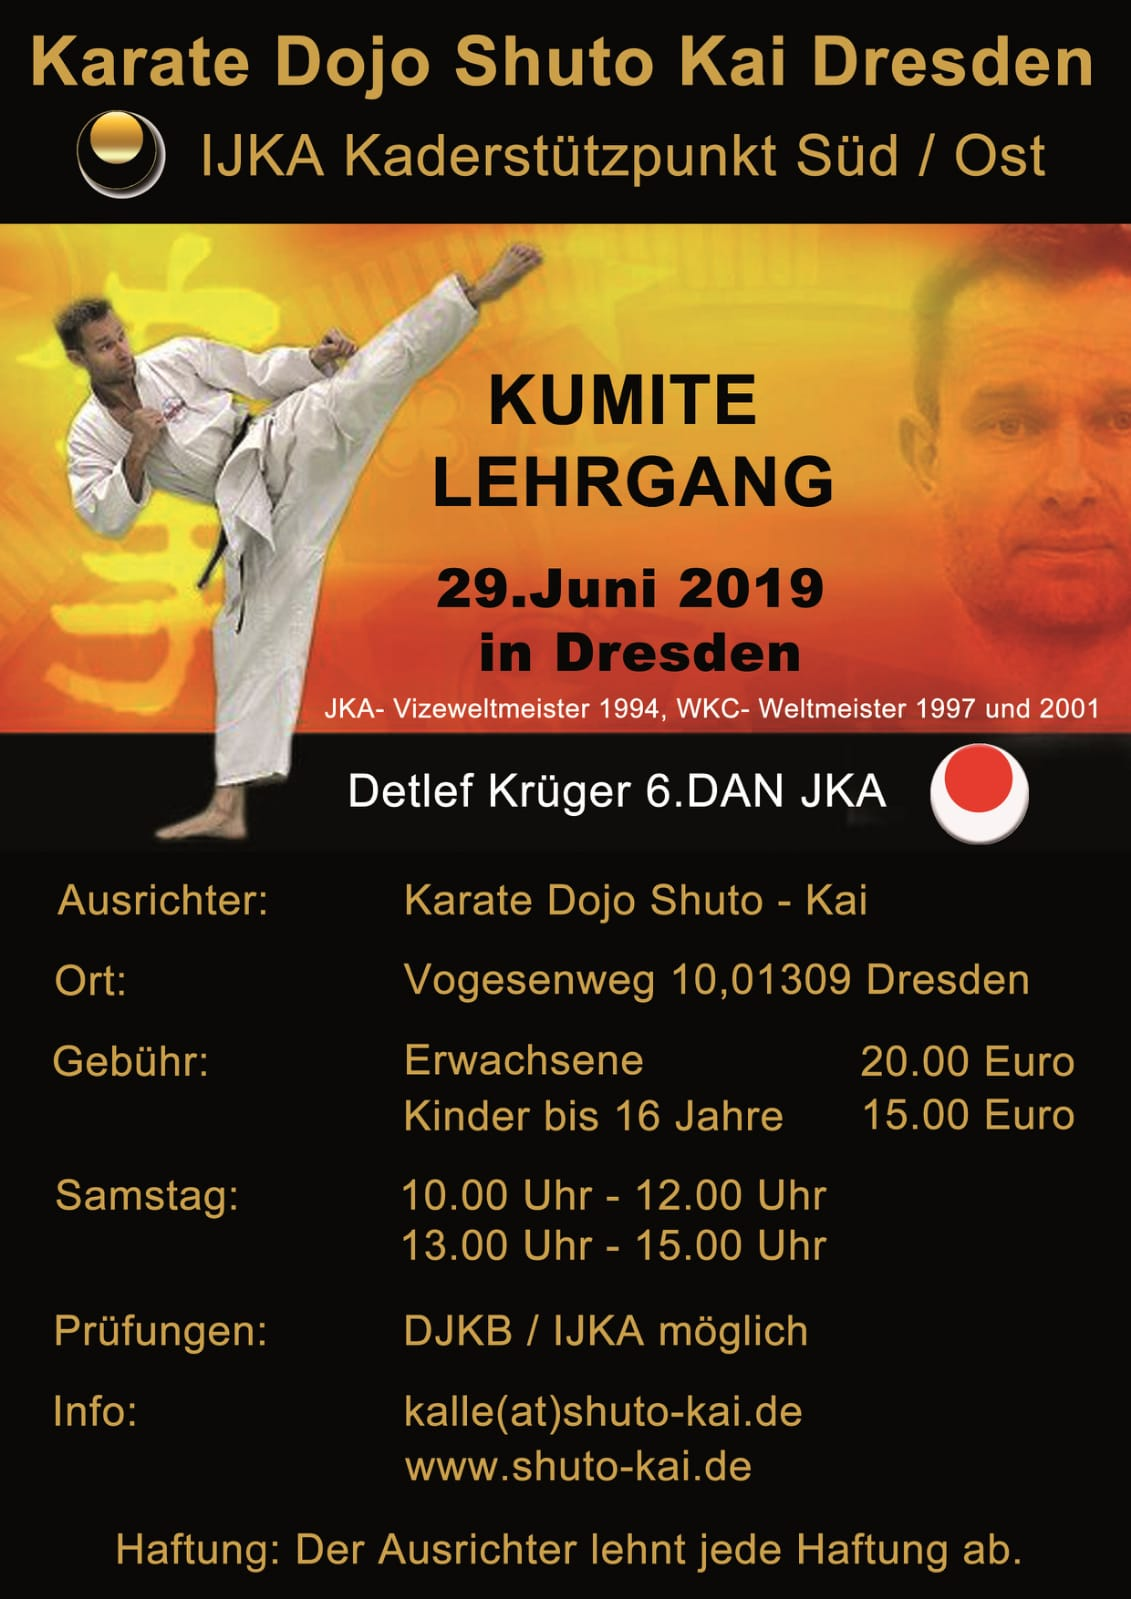 Kumite Lehrgang mit Detlef Krüger 6. DAN JKA @ Trainingshalle Shuto Kai